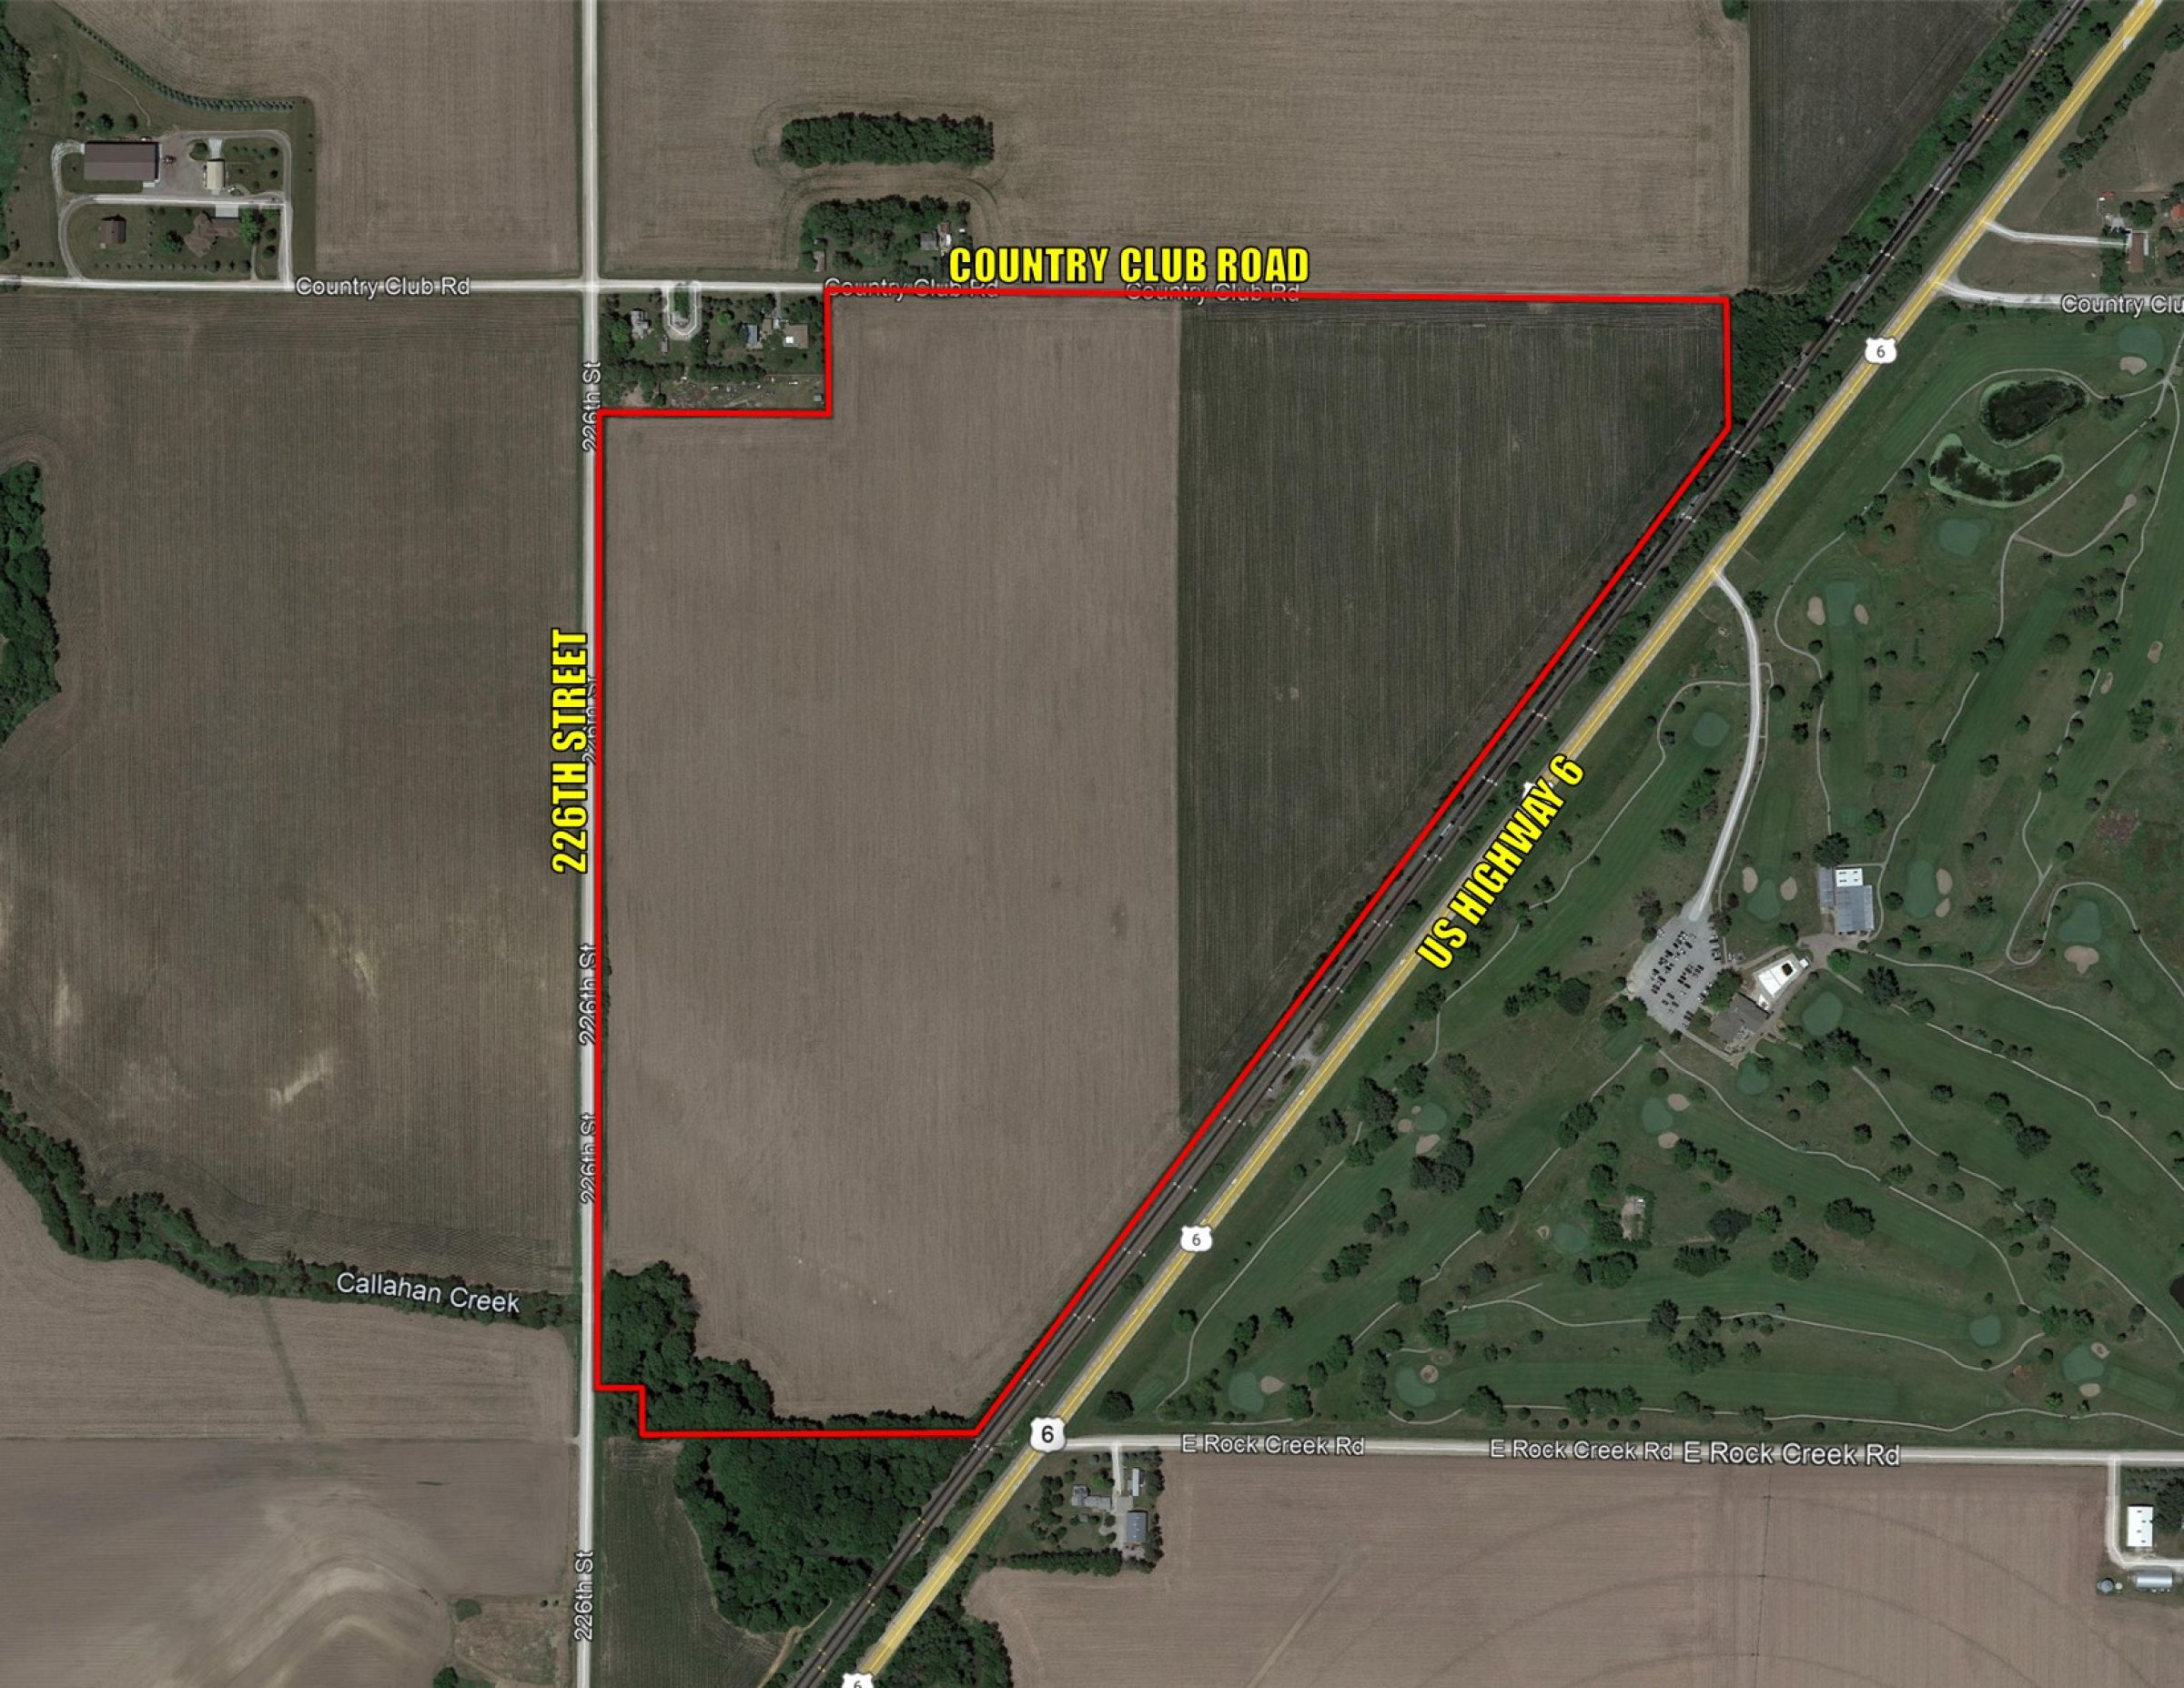 auctions-land-cass-county-nebraska-107-acres-listing-number-15713-0-2021-09-02-173951.jpg